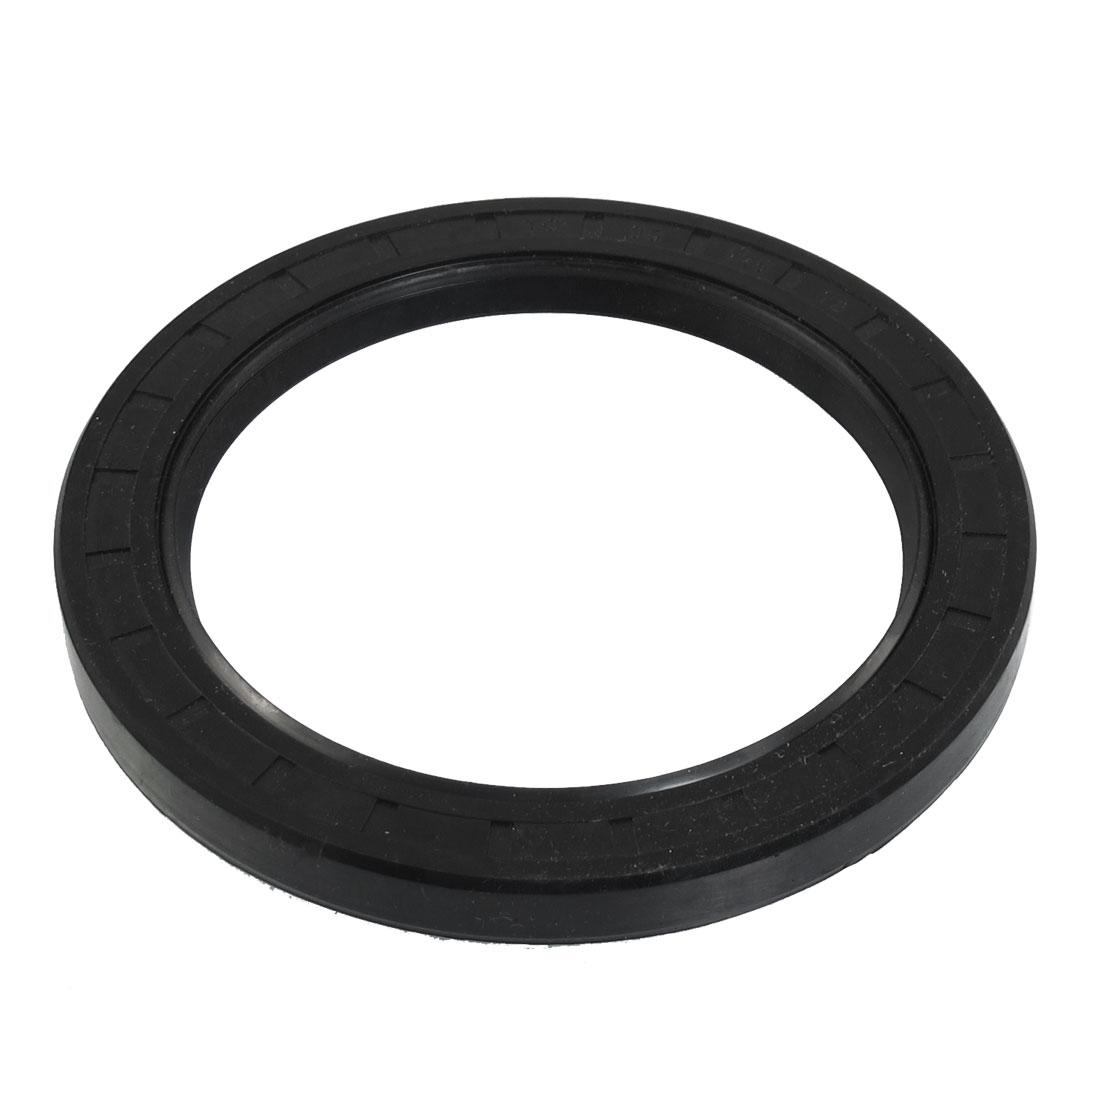 Black Nitrile Rubber Dual Lips Oil Shaft Seal TC 95mm x 125mm x 12mm